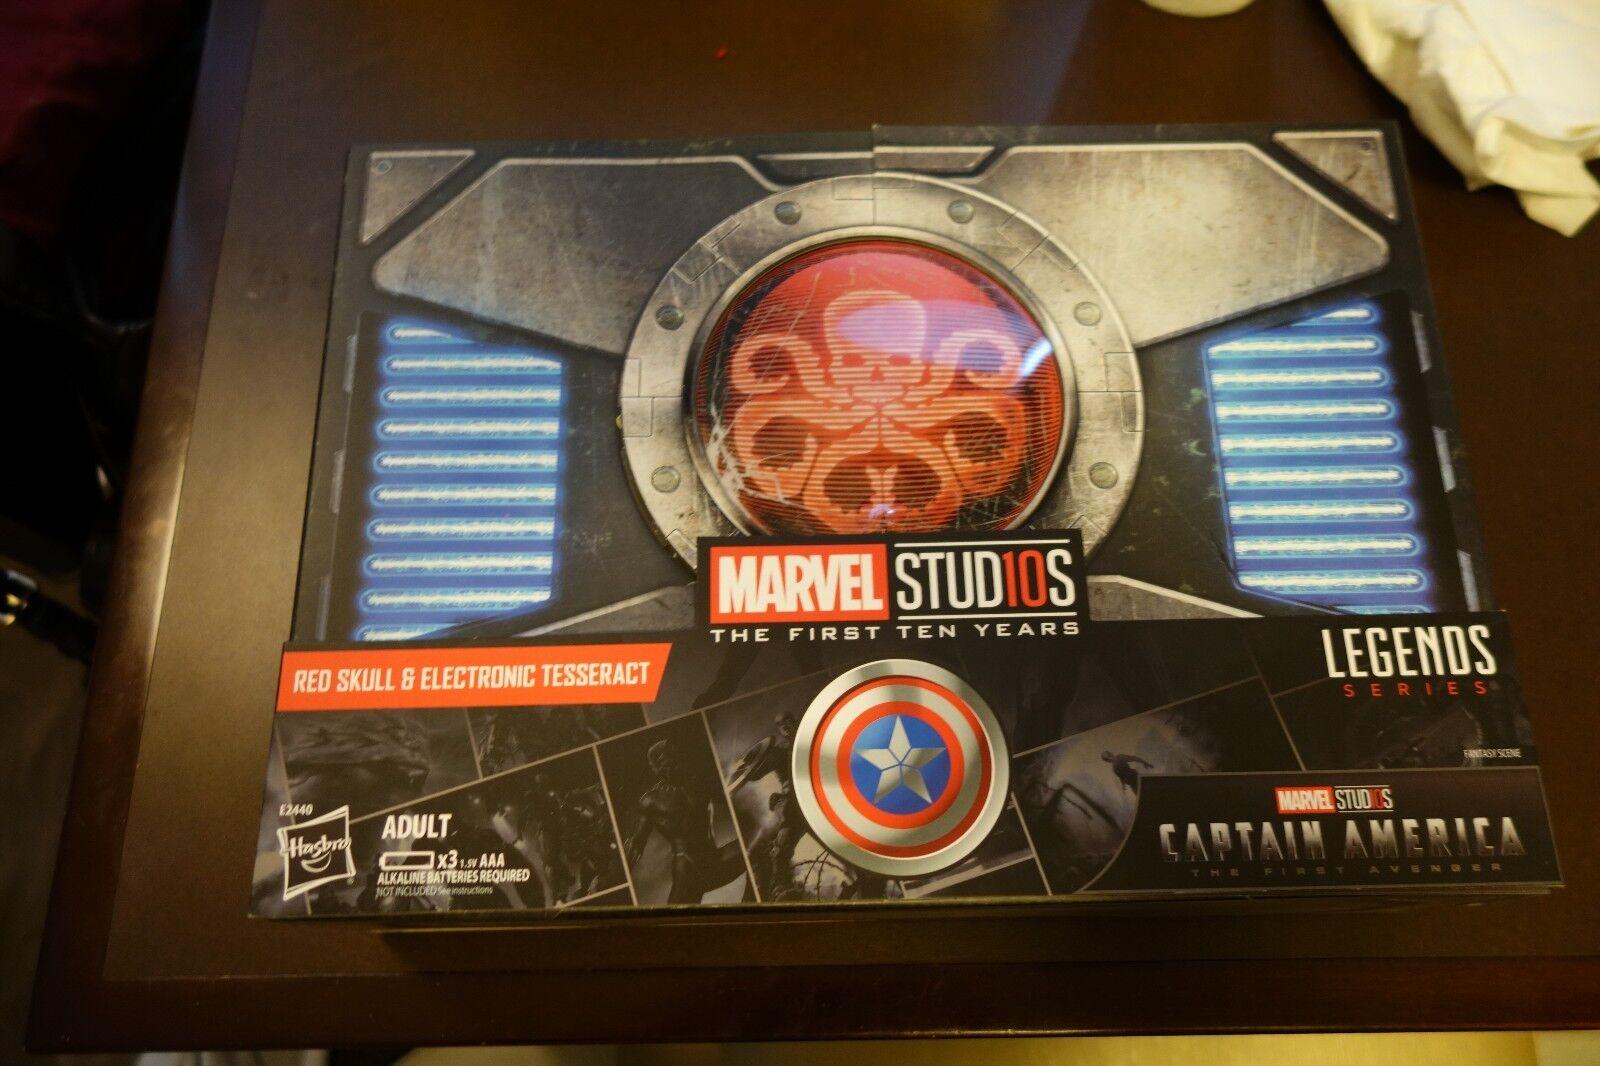 2018 SDCC Hasbro Marvel Legends Series rosso  Skull cifra & Electronic Tesseract  prezzi più bassi